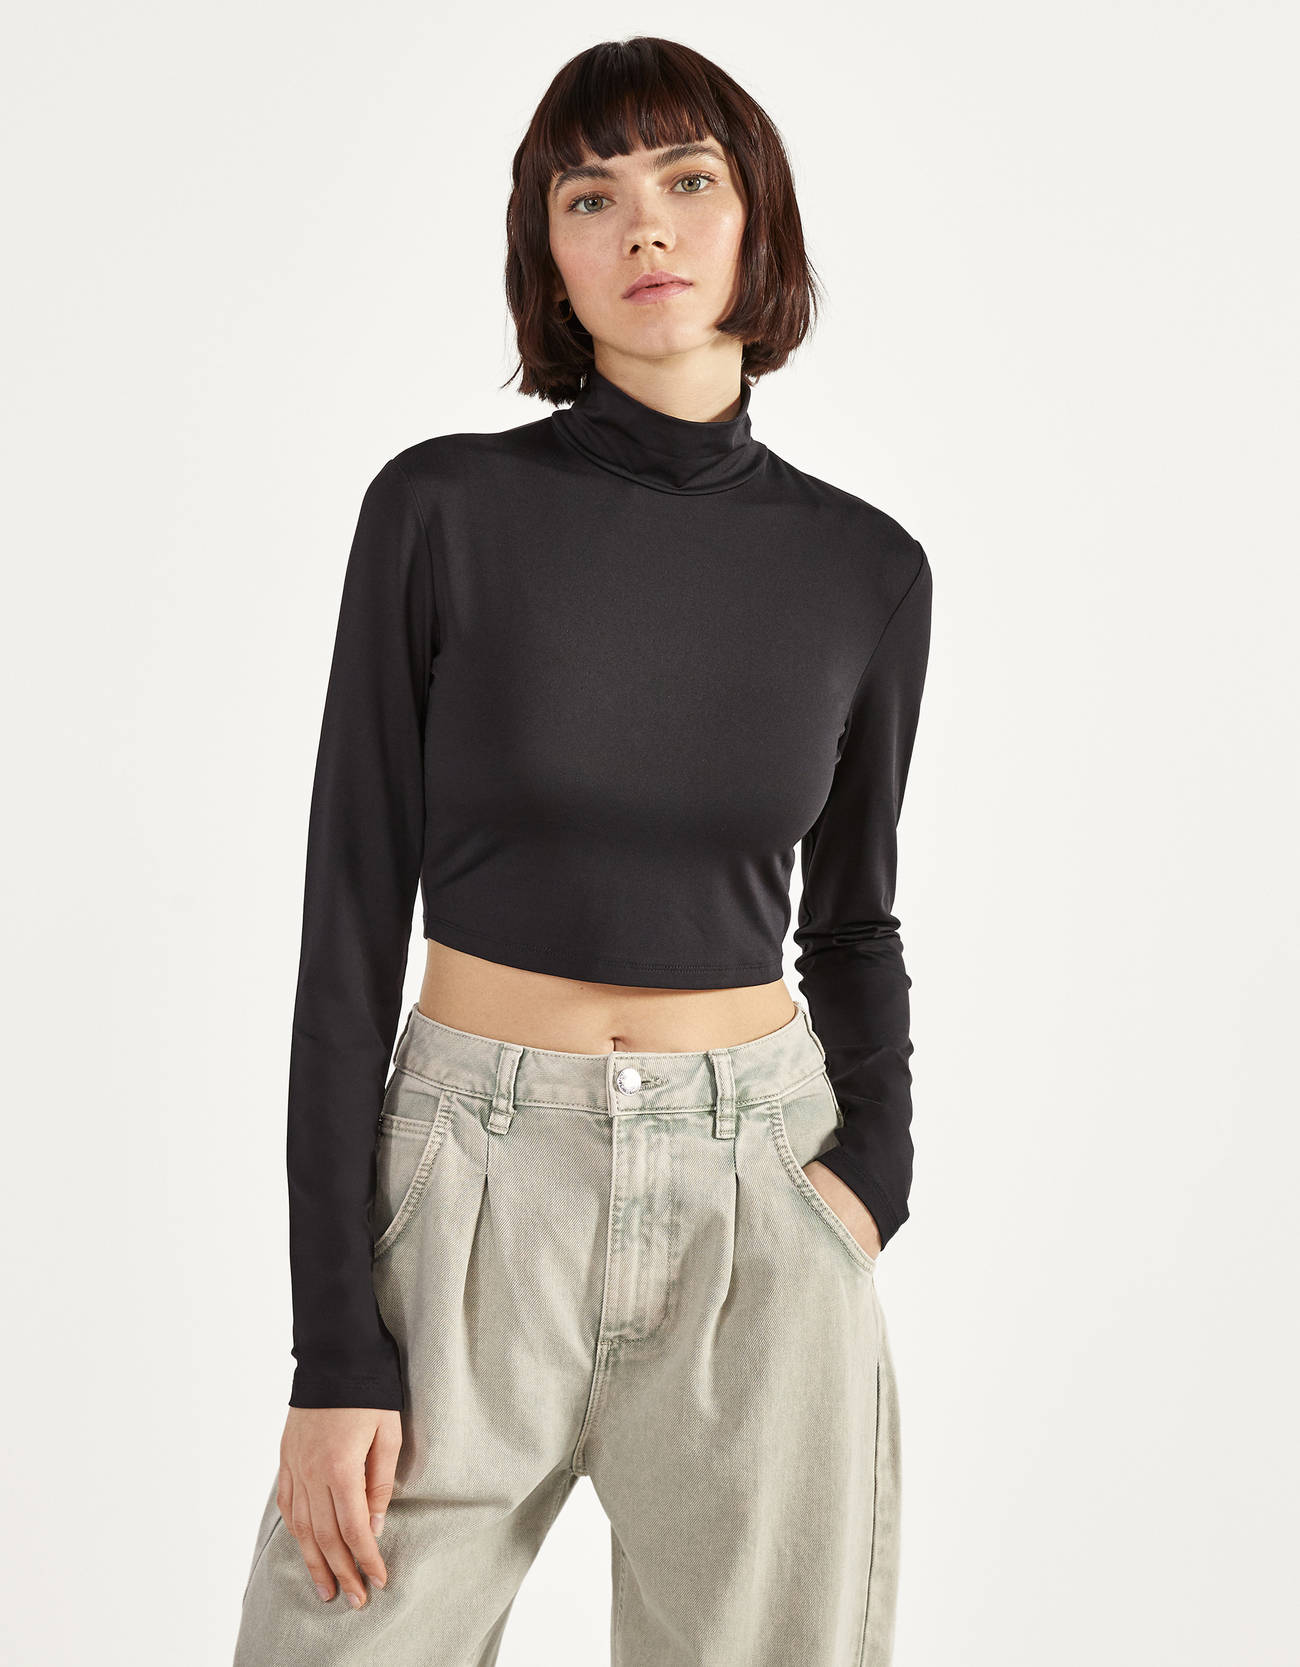 Camiseta cropped de cuello alto y manga larga